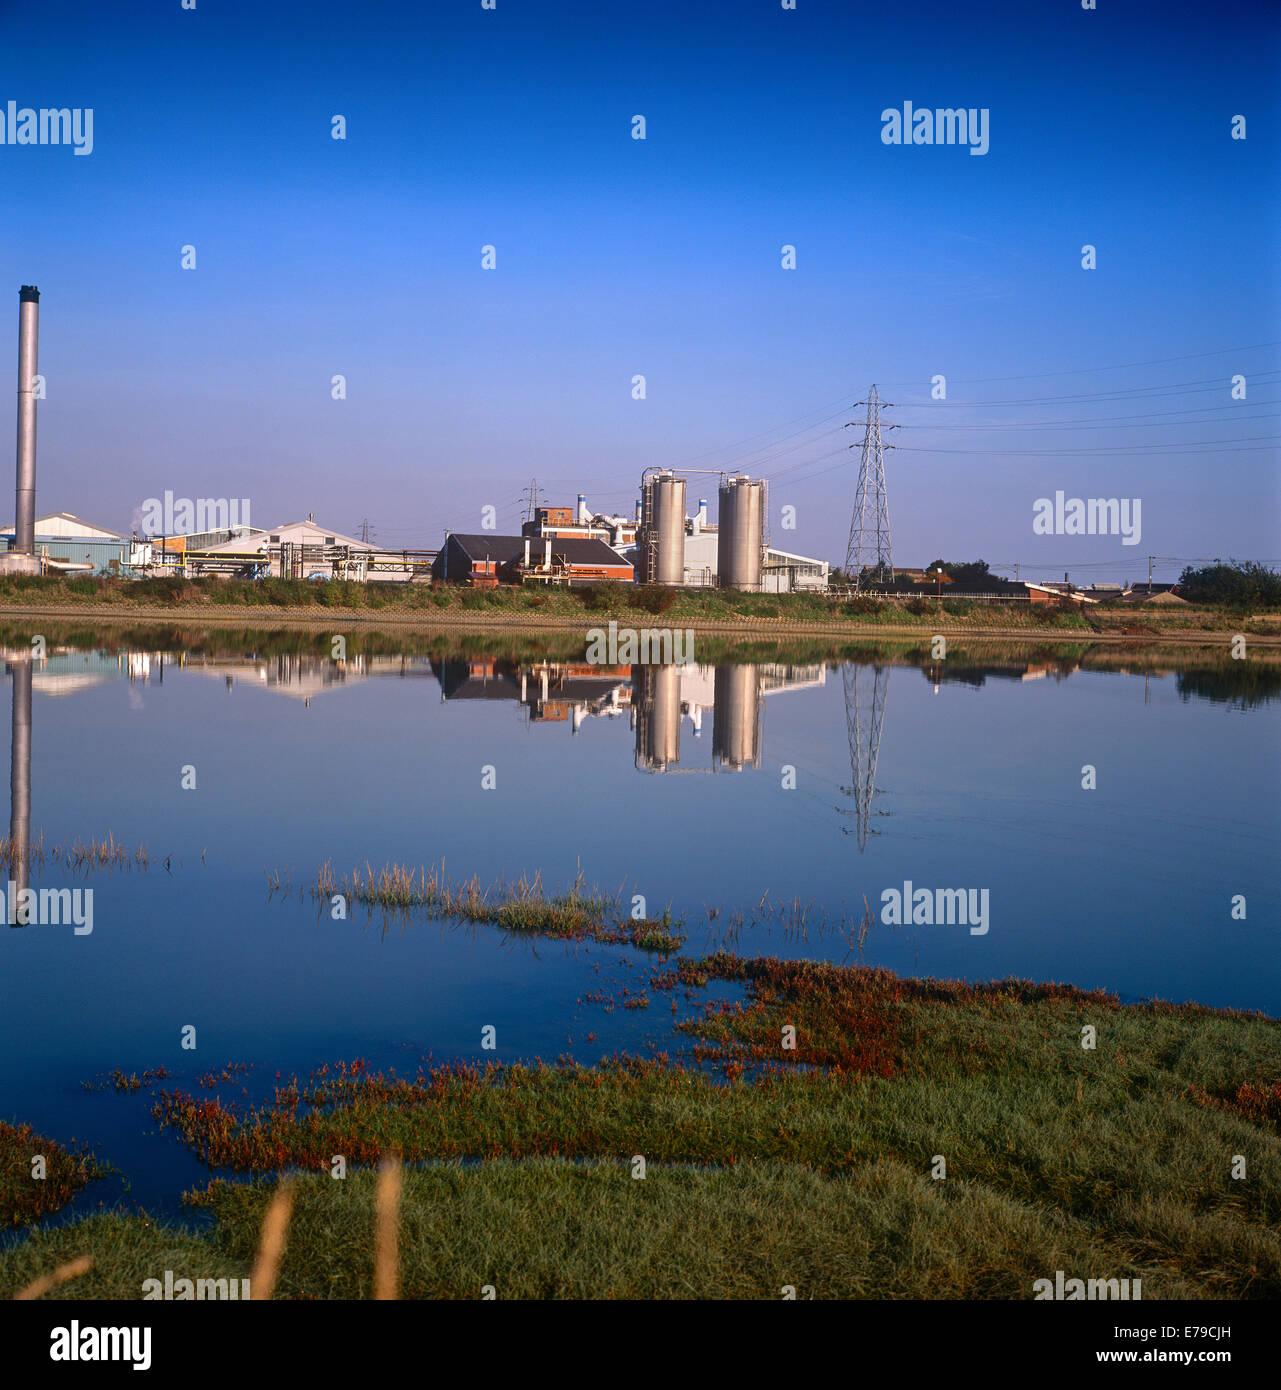 Bâtiments industriels en usine Brantham Photo Stock